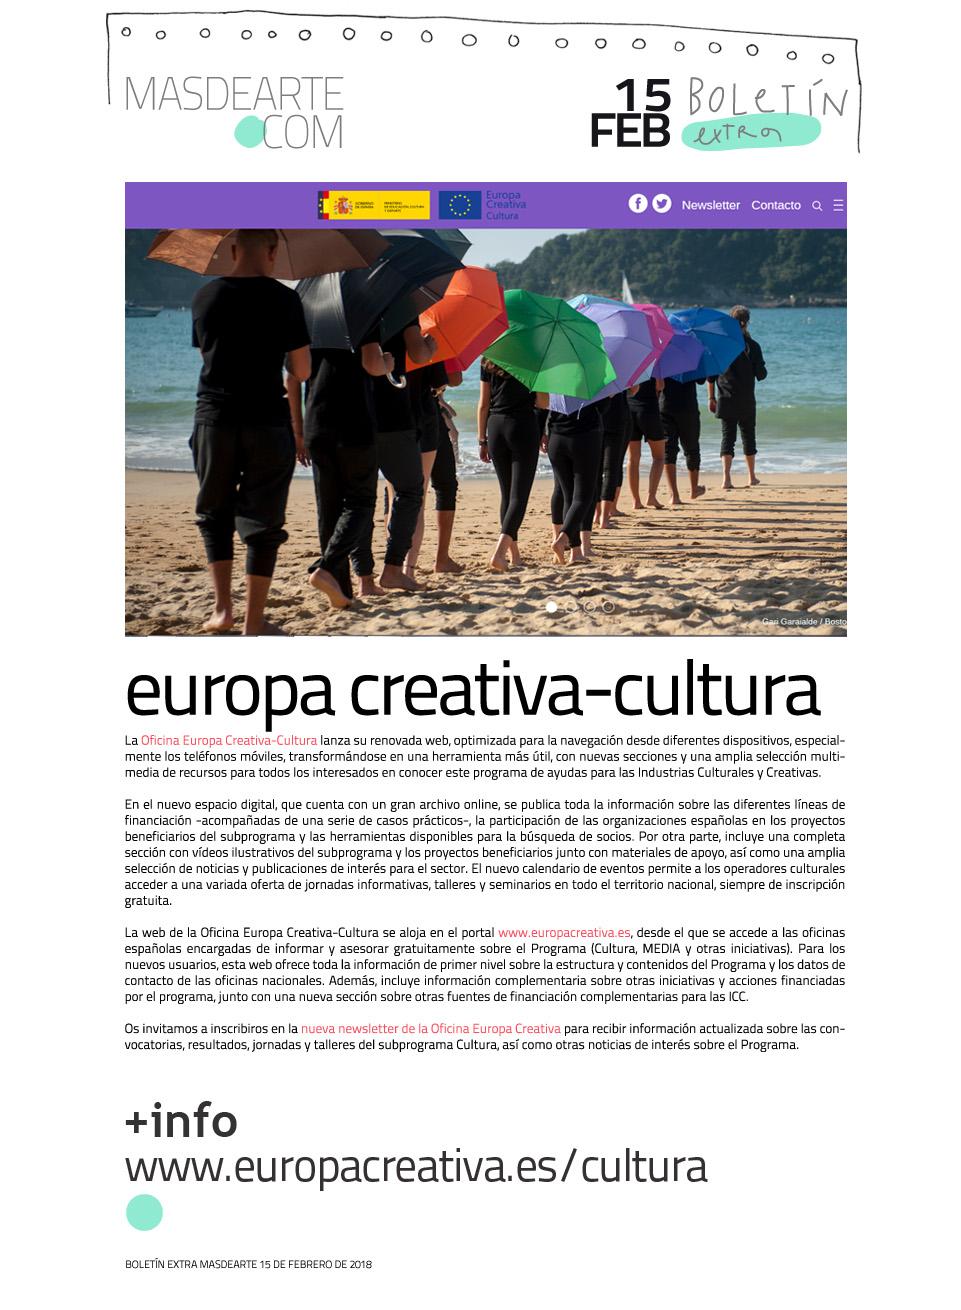 La Oficina Europa Creativa-Cultura estrena web: www.europacreativa.es/cultura